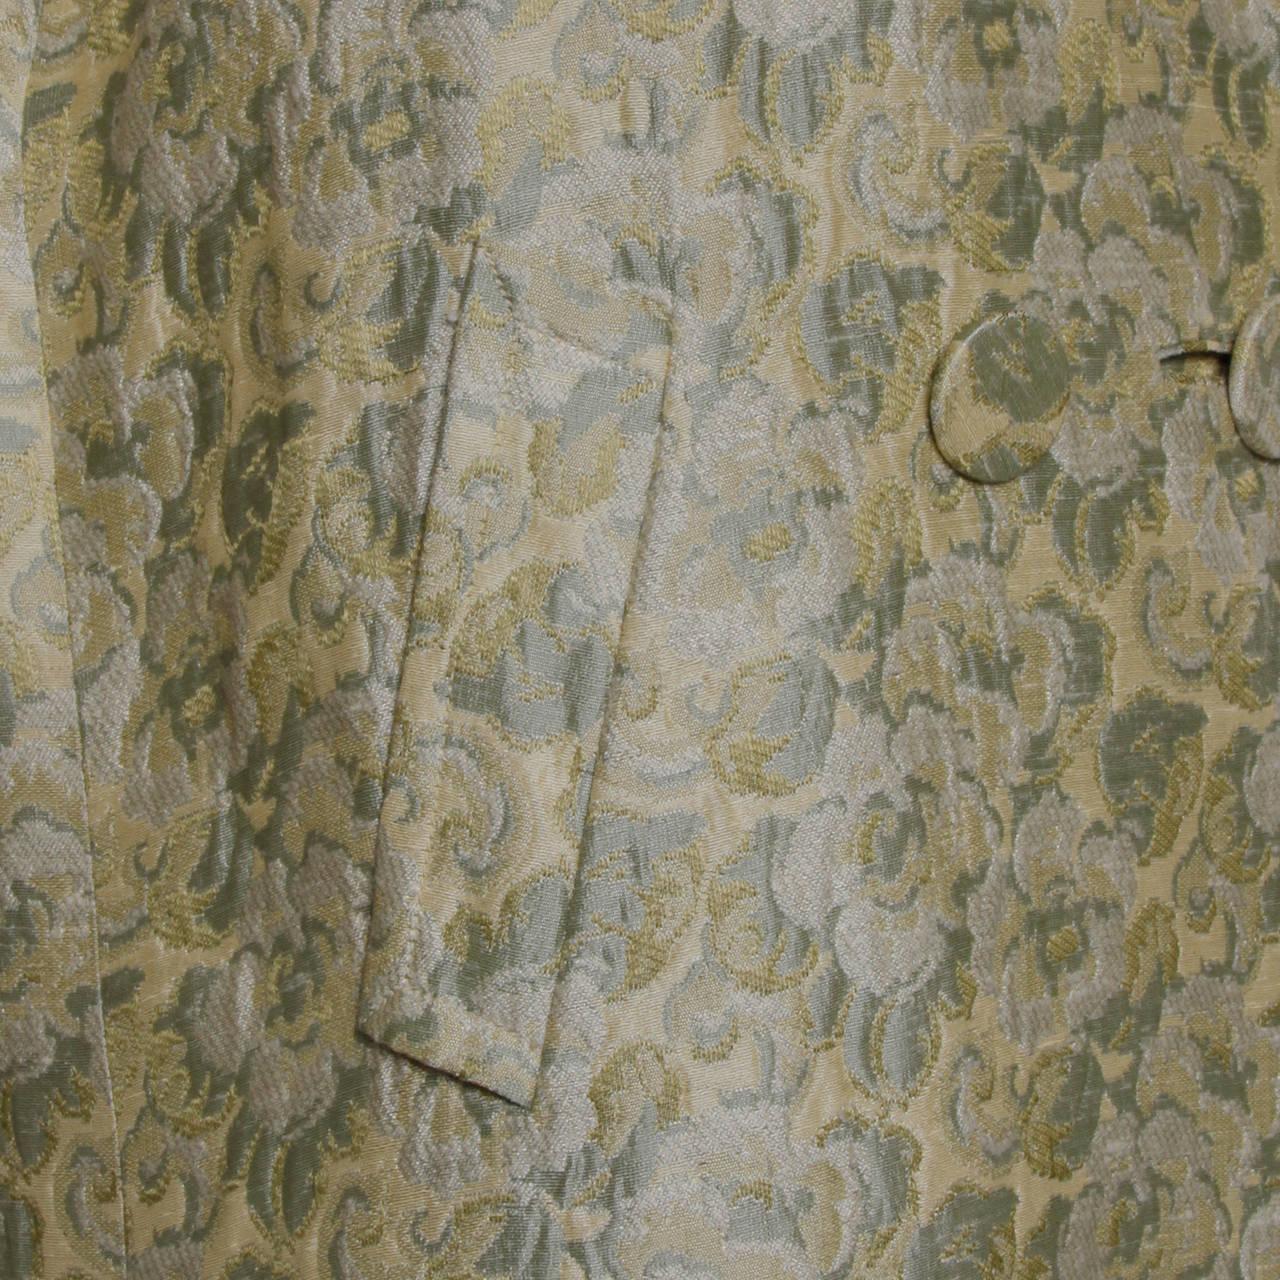 Joseph Magnin 1960s Vintage Metallic Brocade Tapestry Trench Coat 6